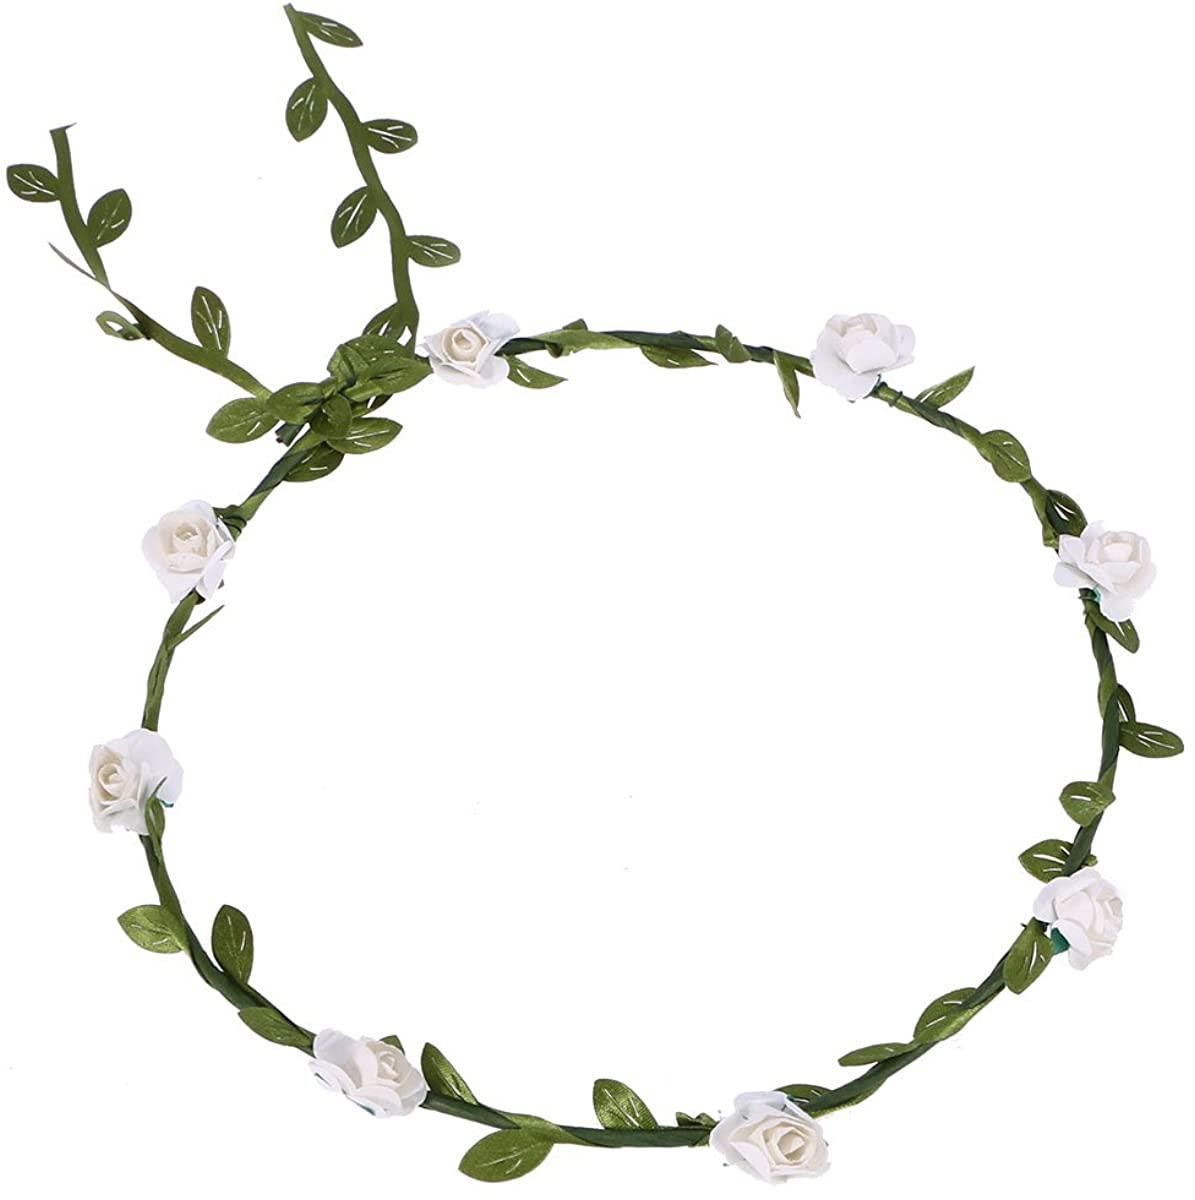 Flower Wreath Headband Crown Halo Floral Garland Bridal Flower Garland for Wedding Party Festivals